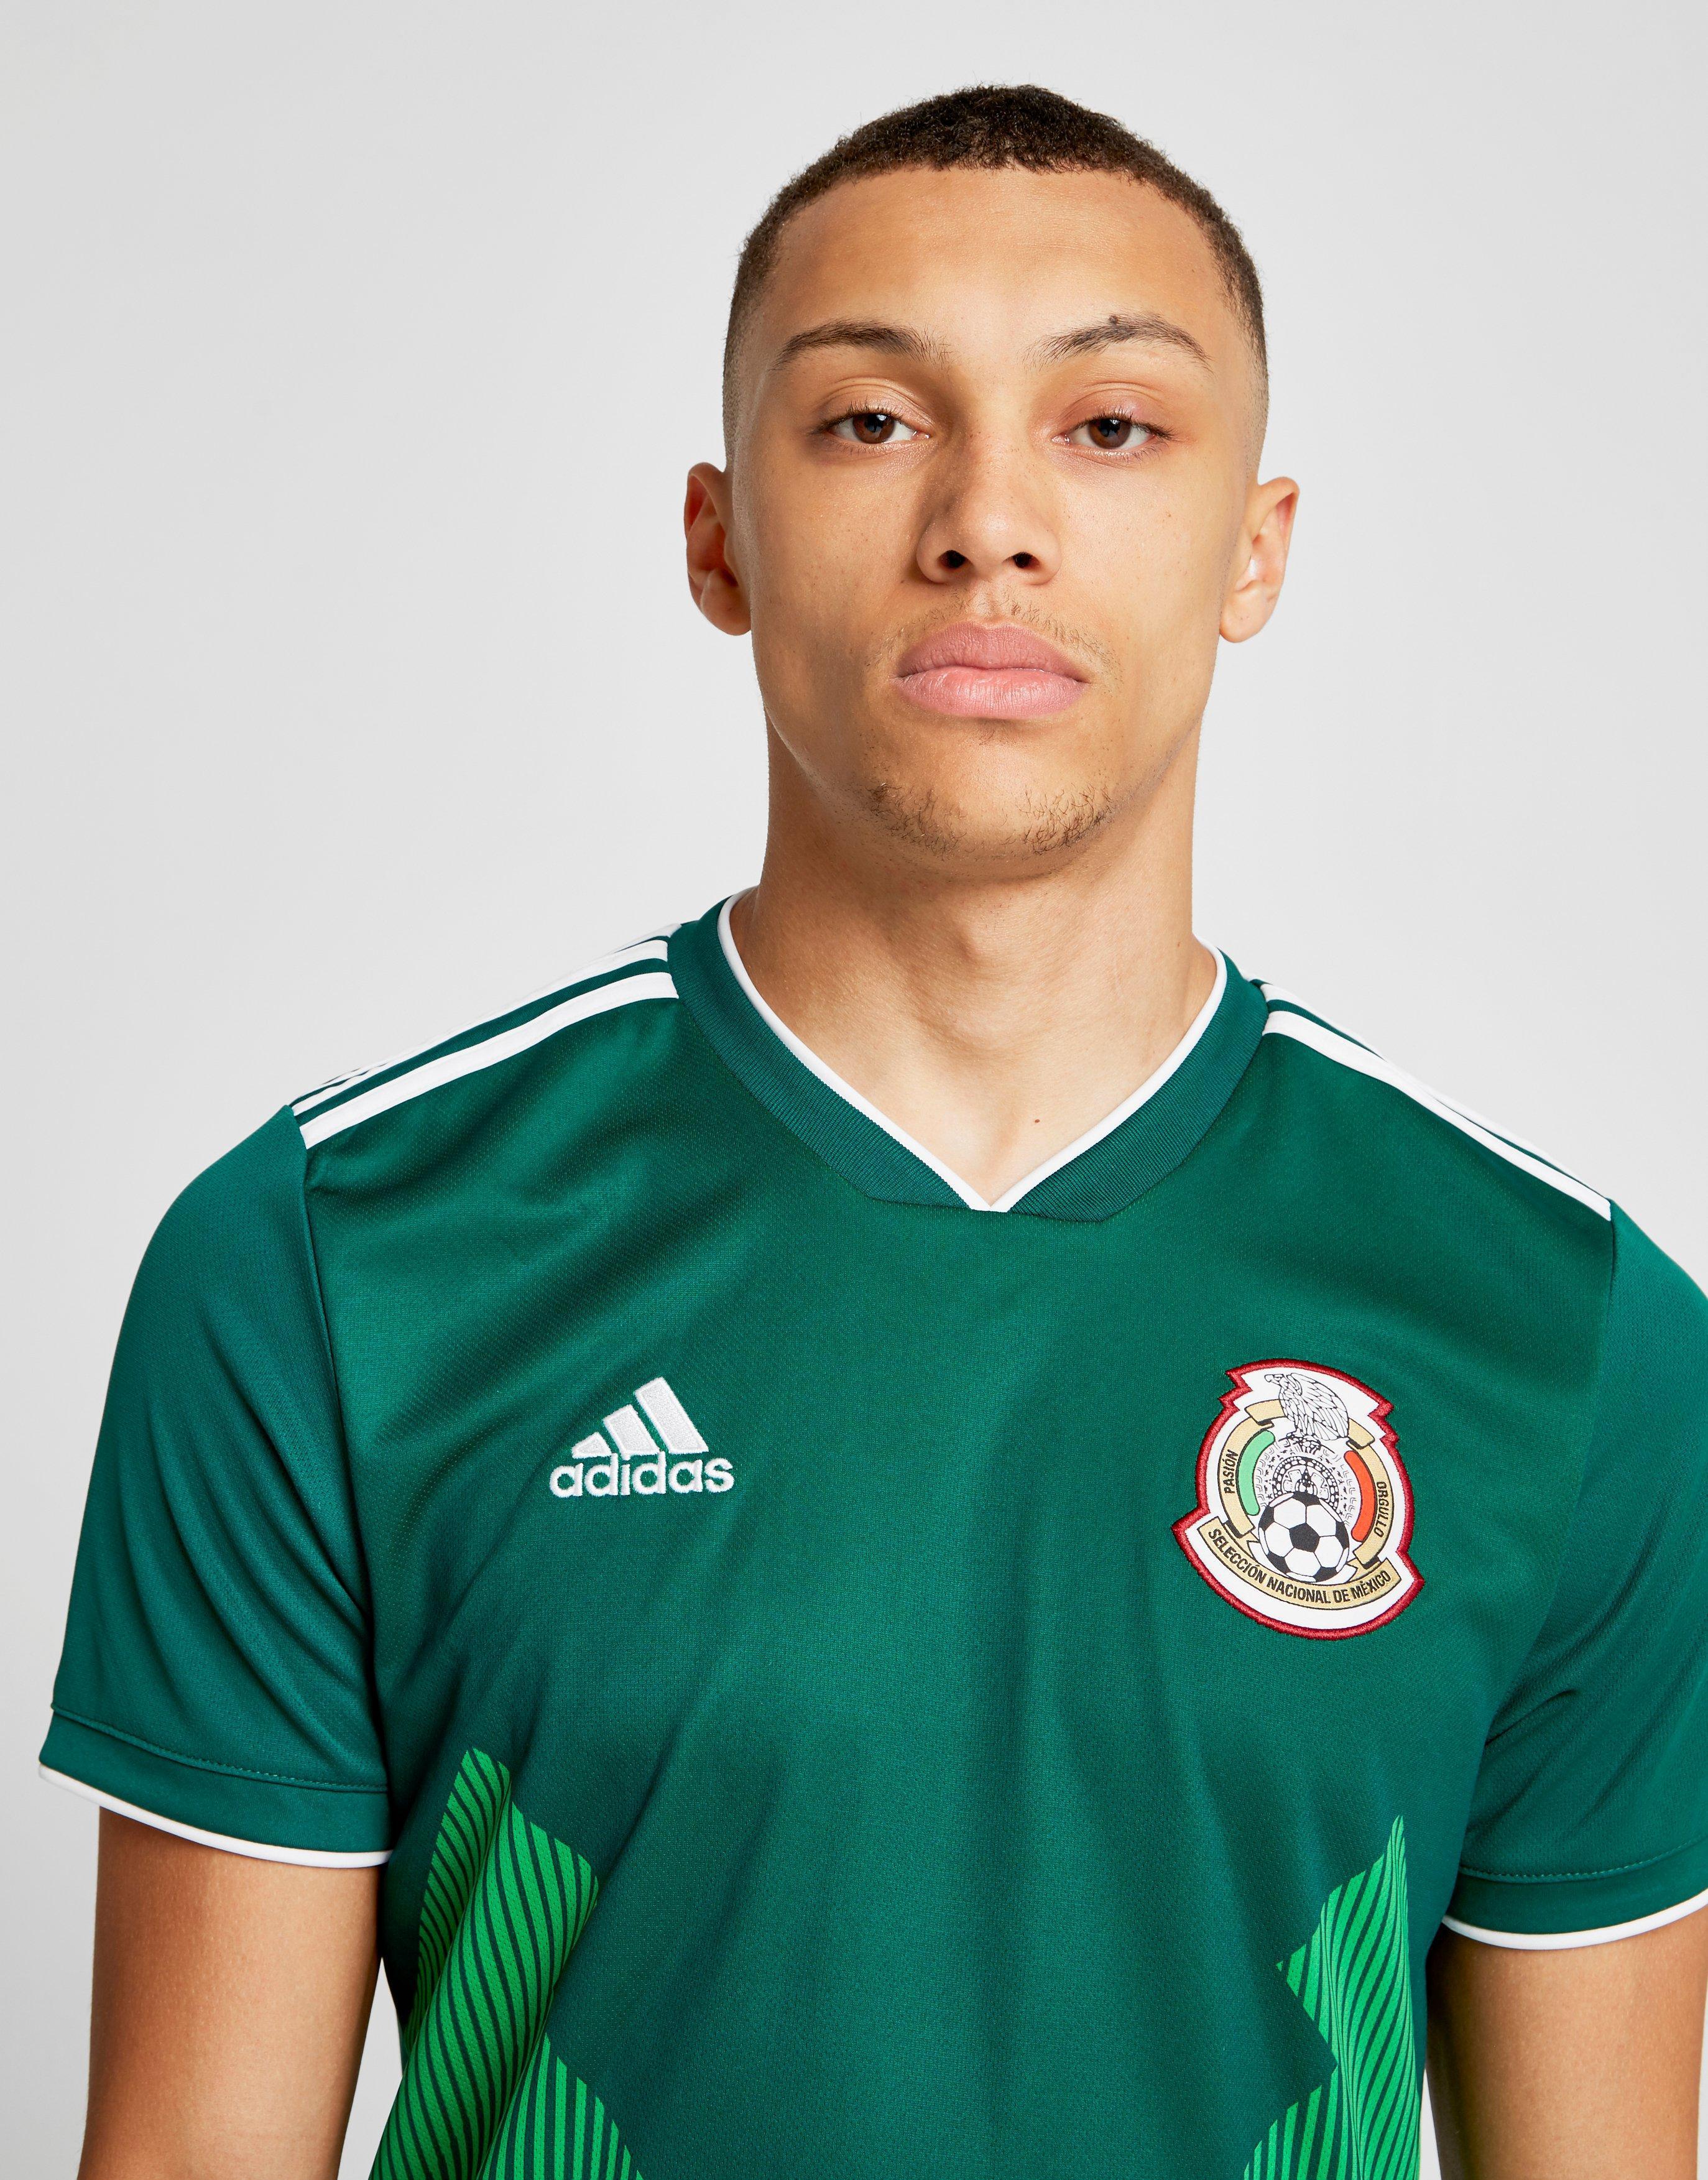 adidas Mexico 2018 Home Shirt in Green for Men - Lyst 4c0a62d96da22